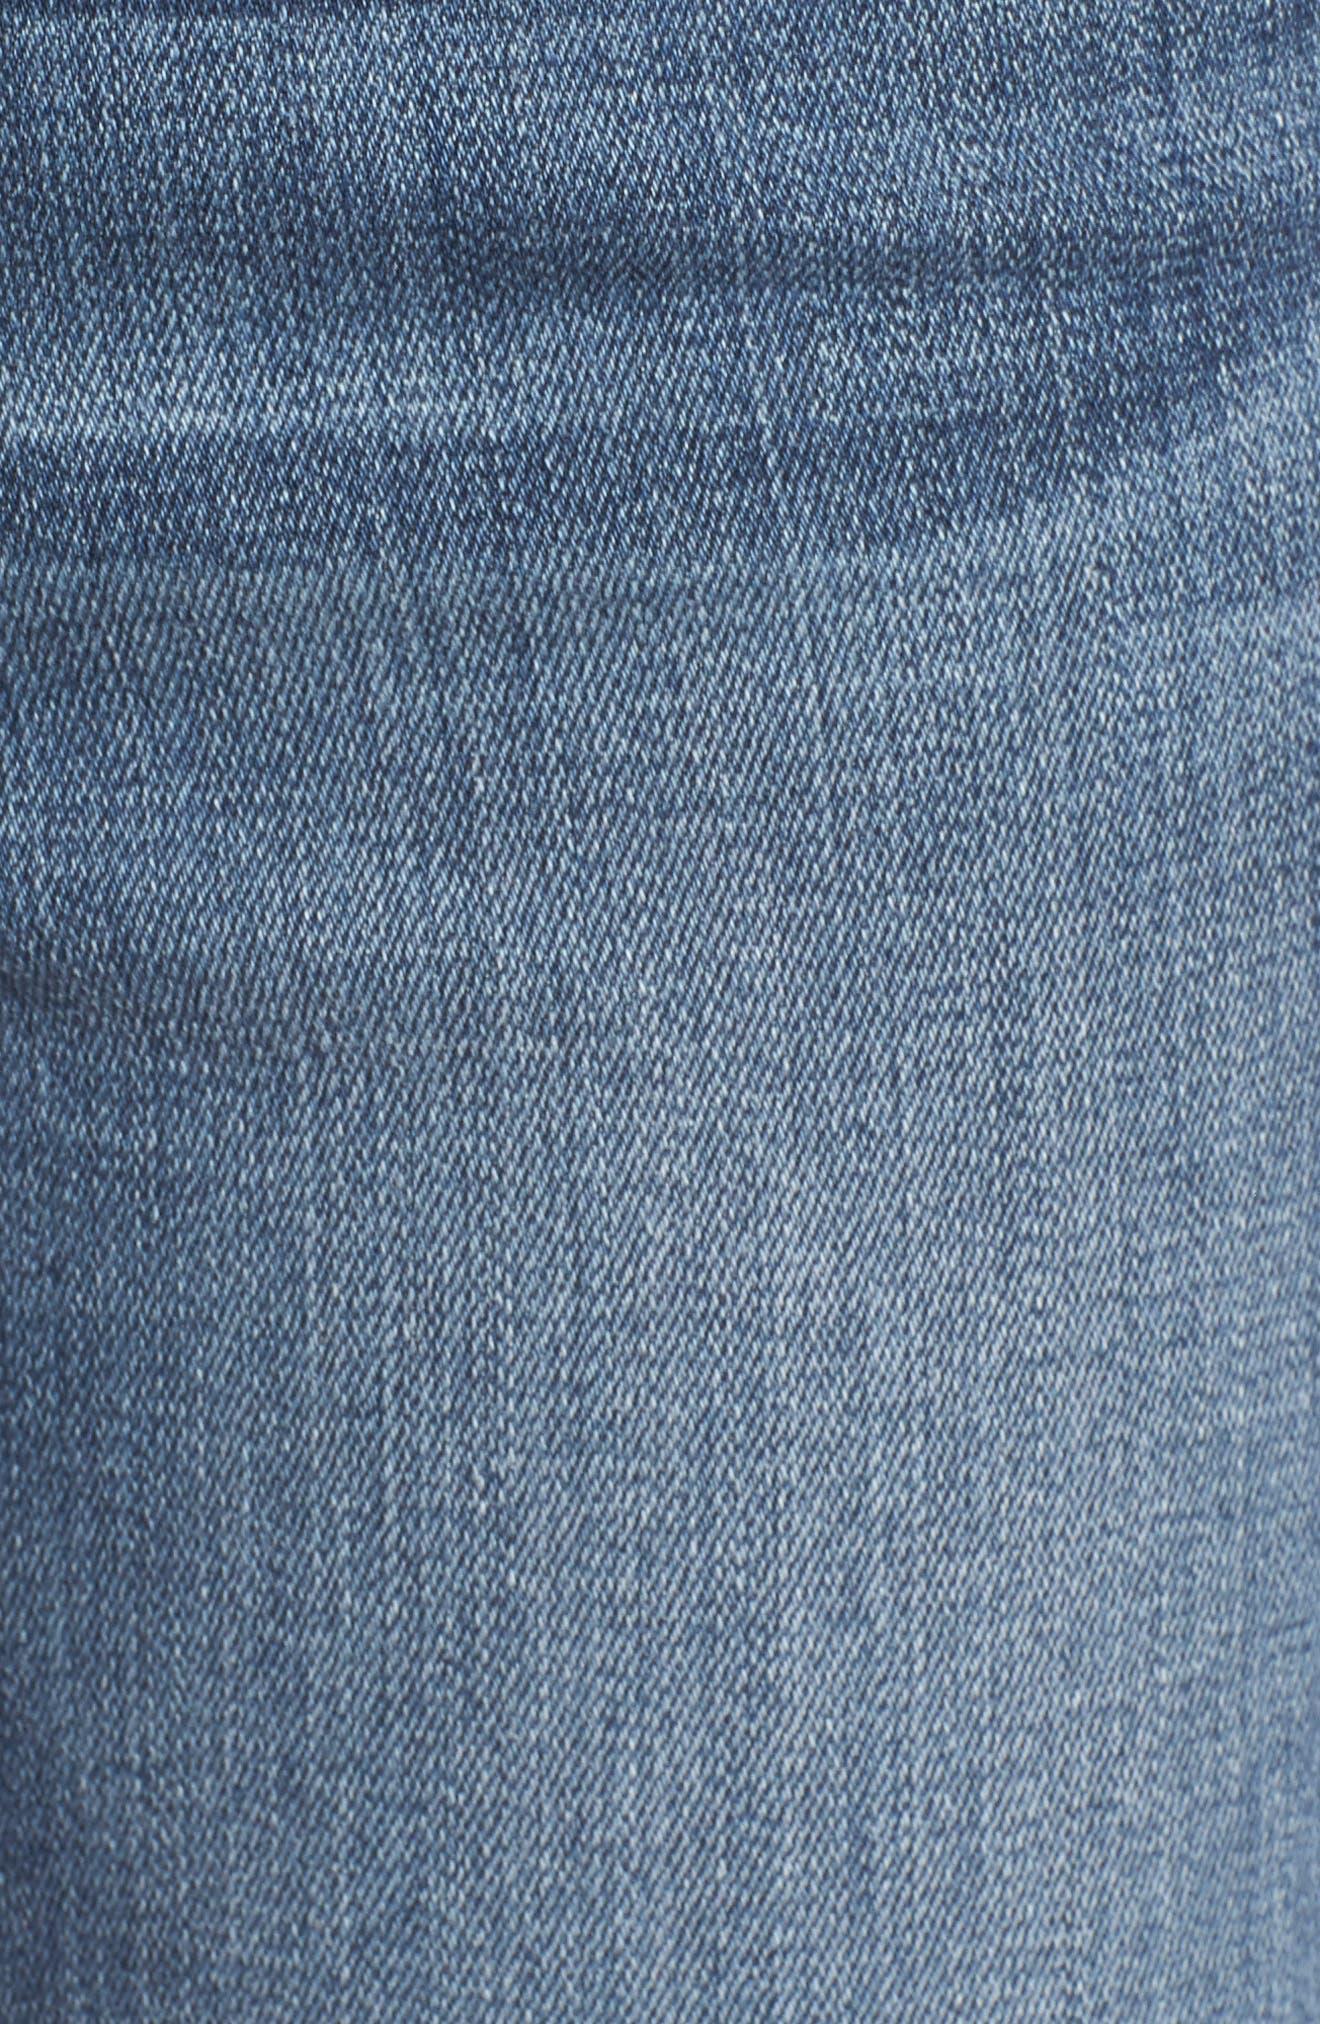 Alternate Image 5  - Good American Good Legs High Waist Ankle Skinny Jeans (Blue 084) (Regular & Plus Size)